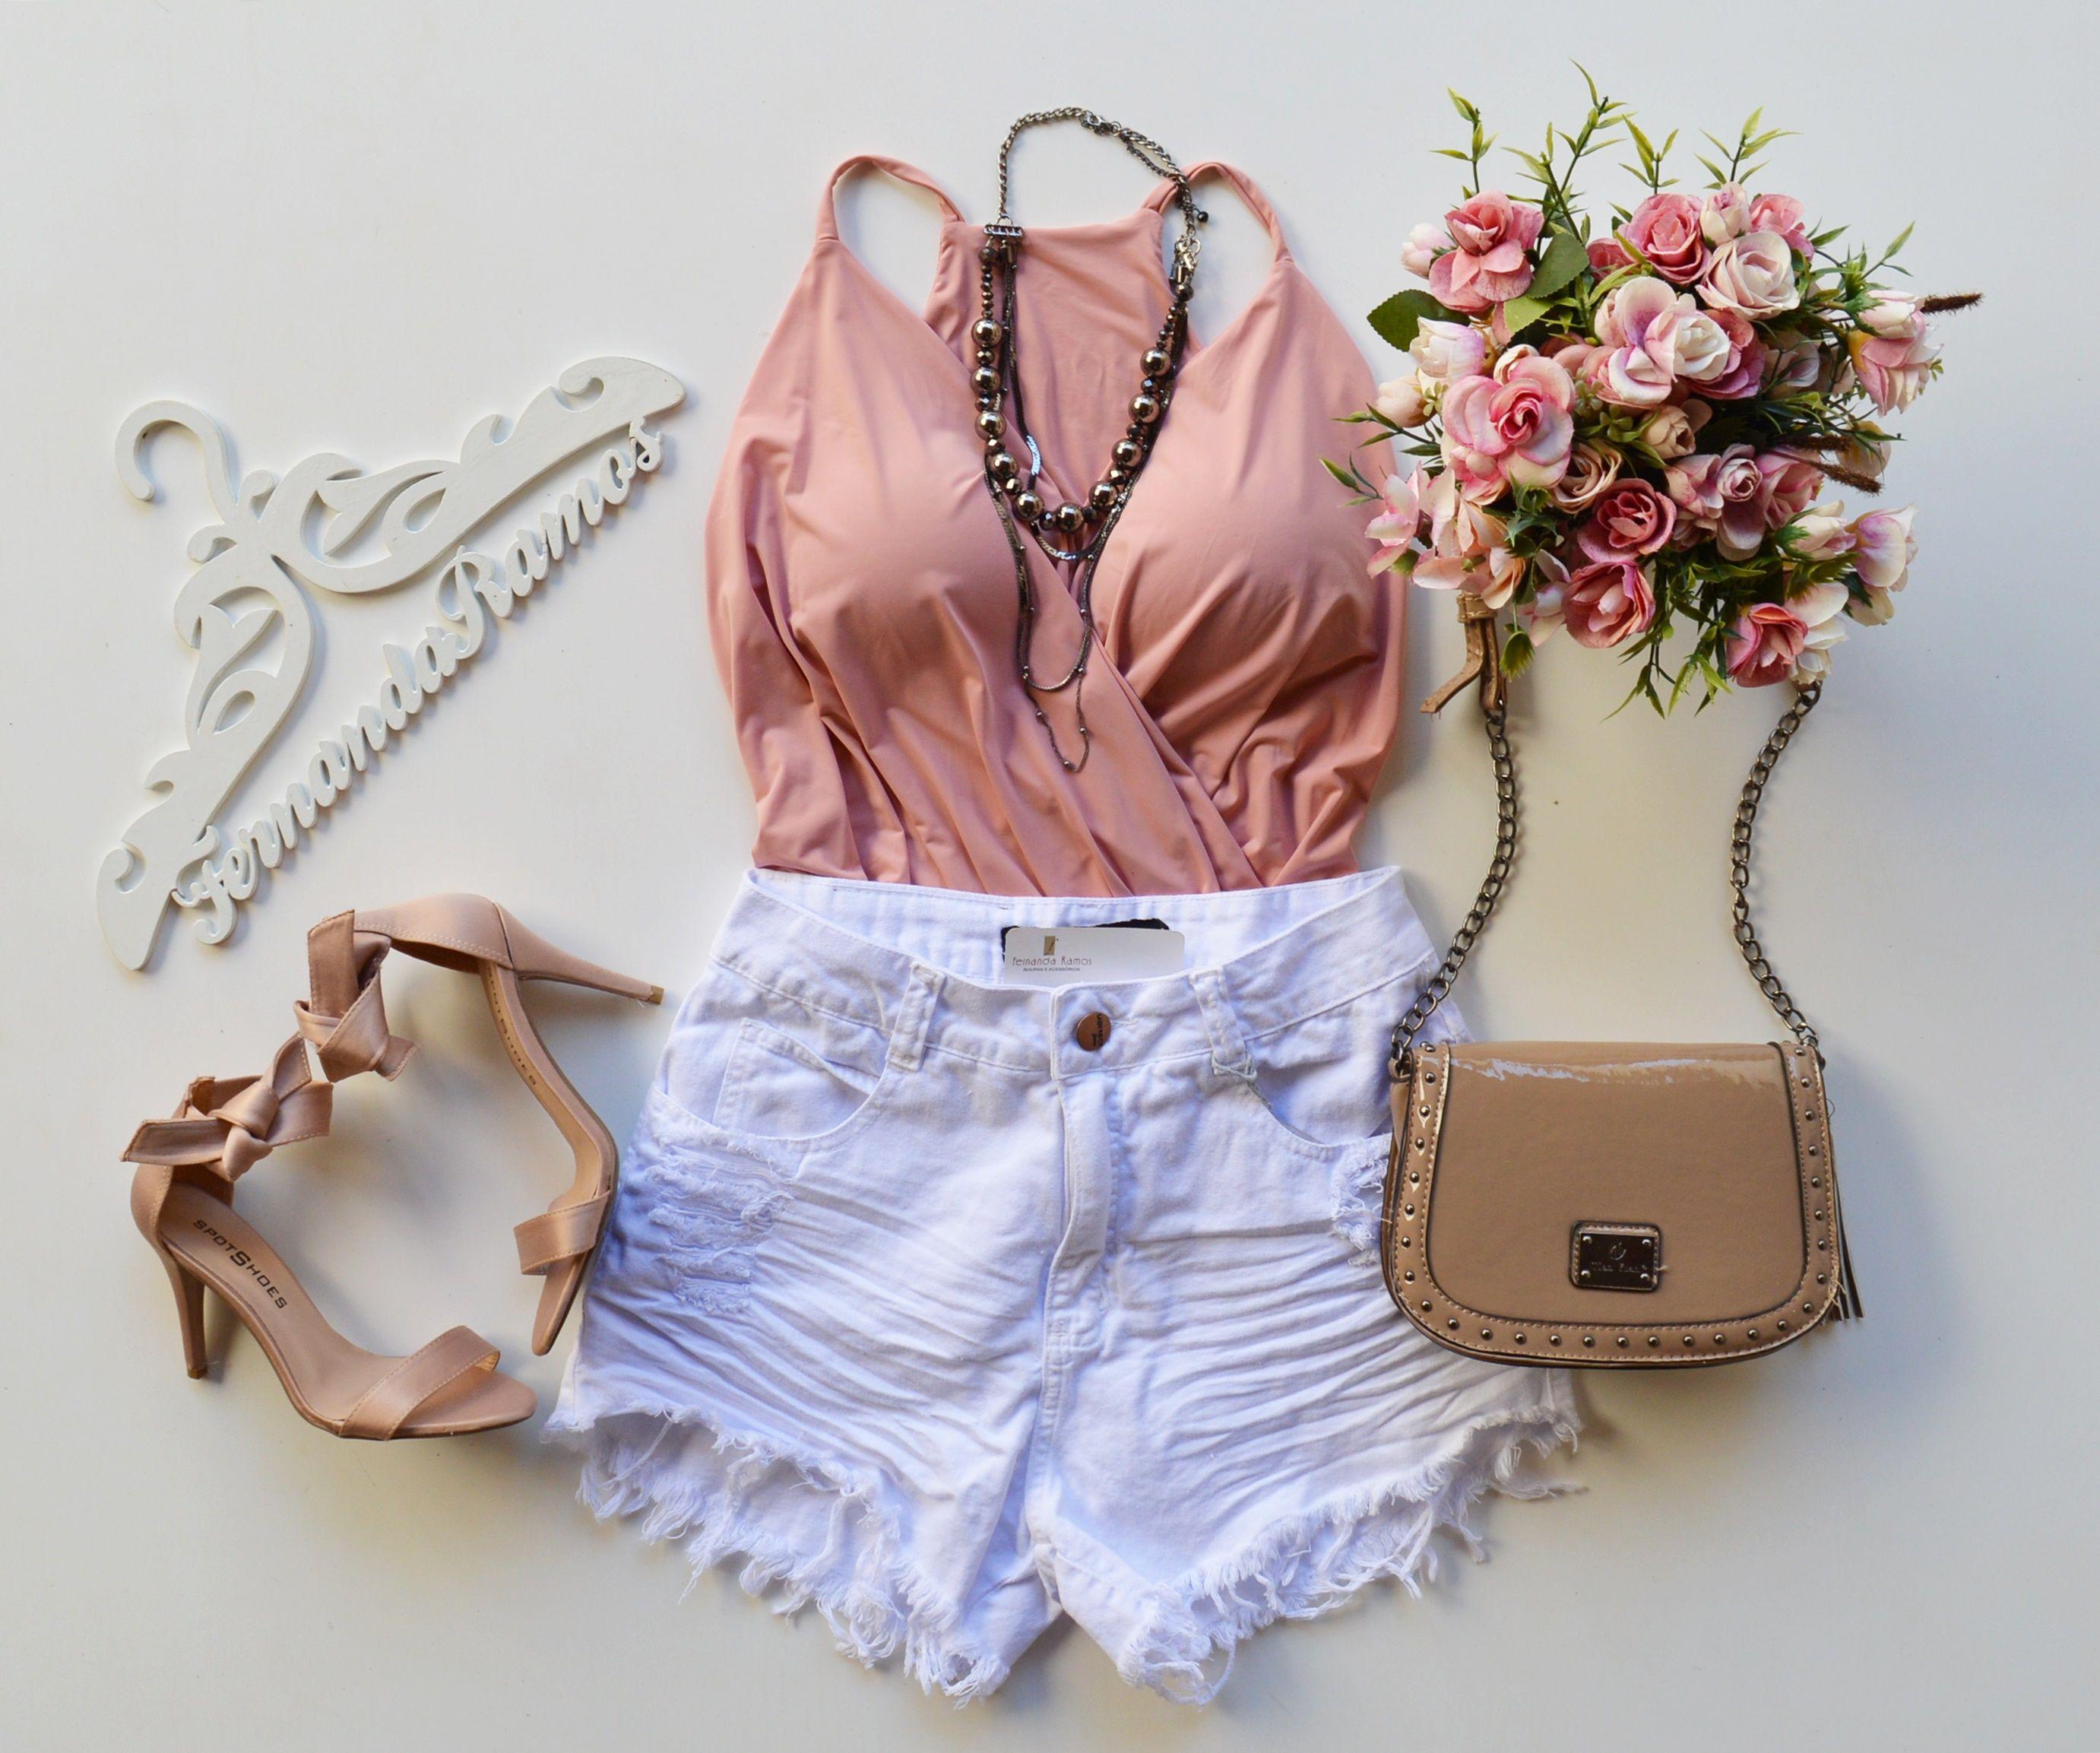 ca24bd833 Pin de Stefany Gabriele en moda feminina | Looks, Roupas tumblr y Roupas